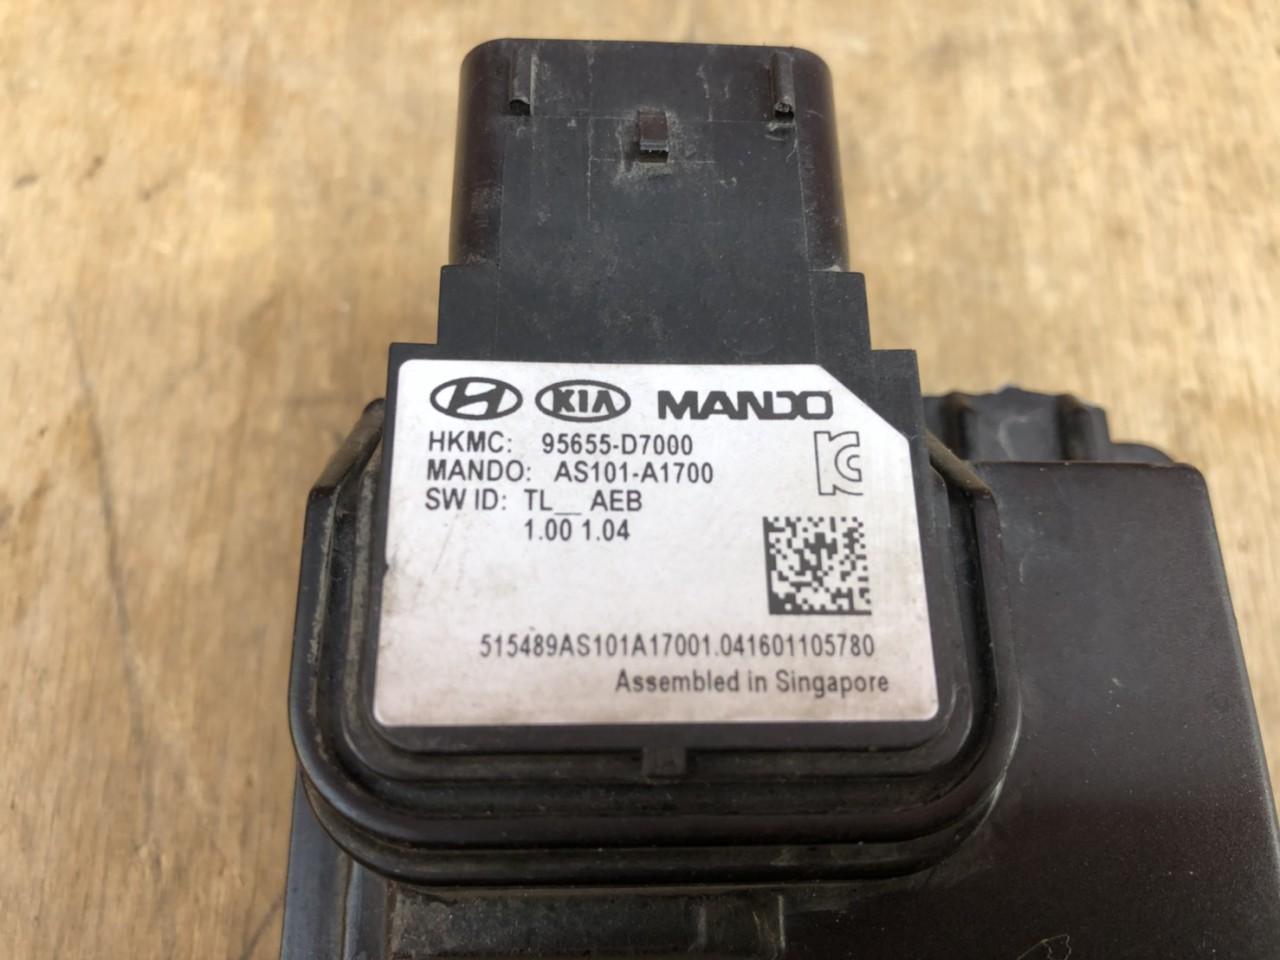 Vand modul distronic/franare Hyundai Tucson 95655-D7000